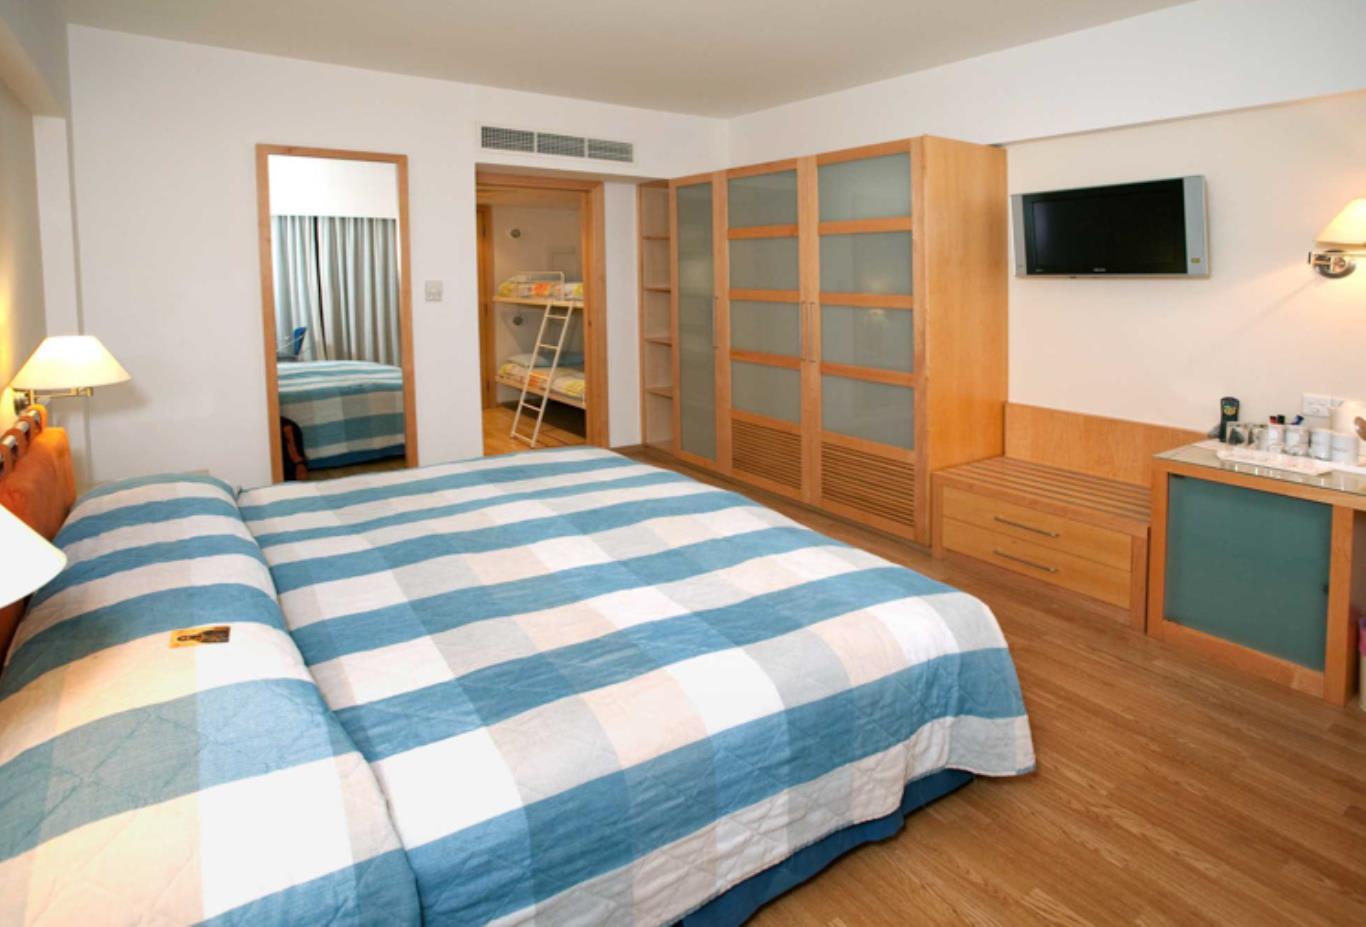 Executive Marina double bed